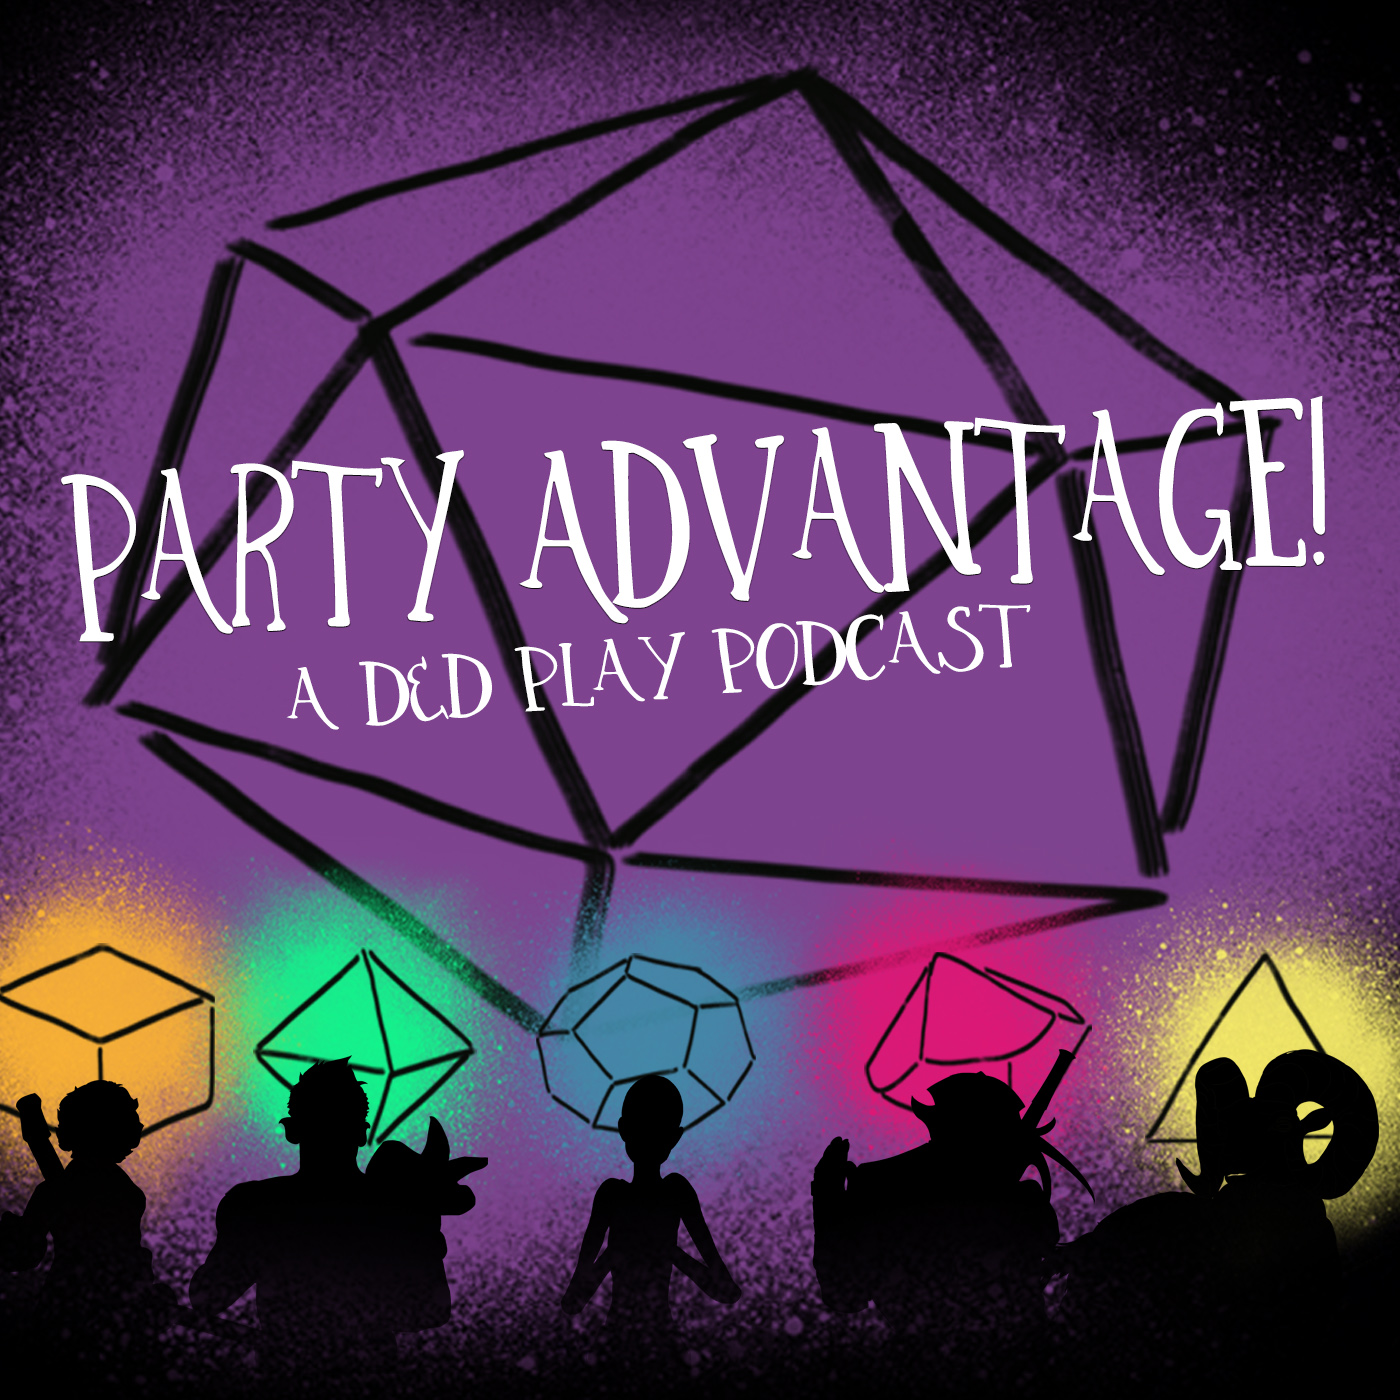 Party Advantage! Logo